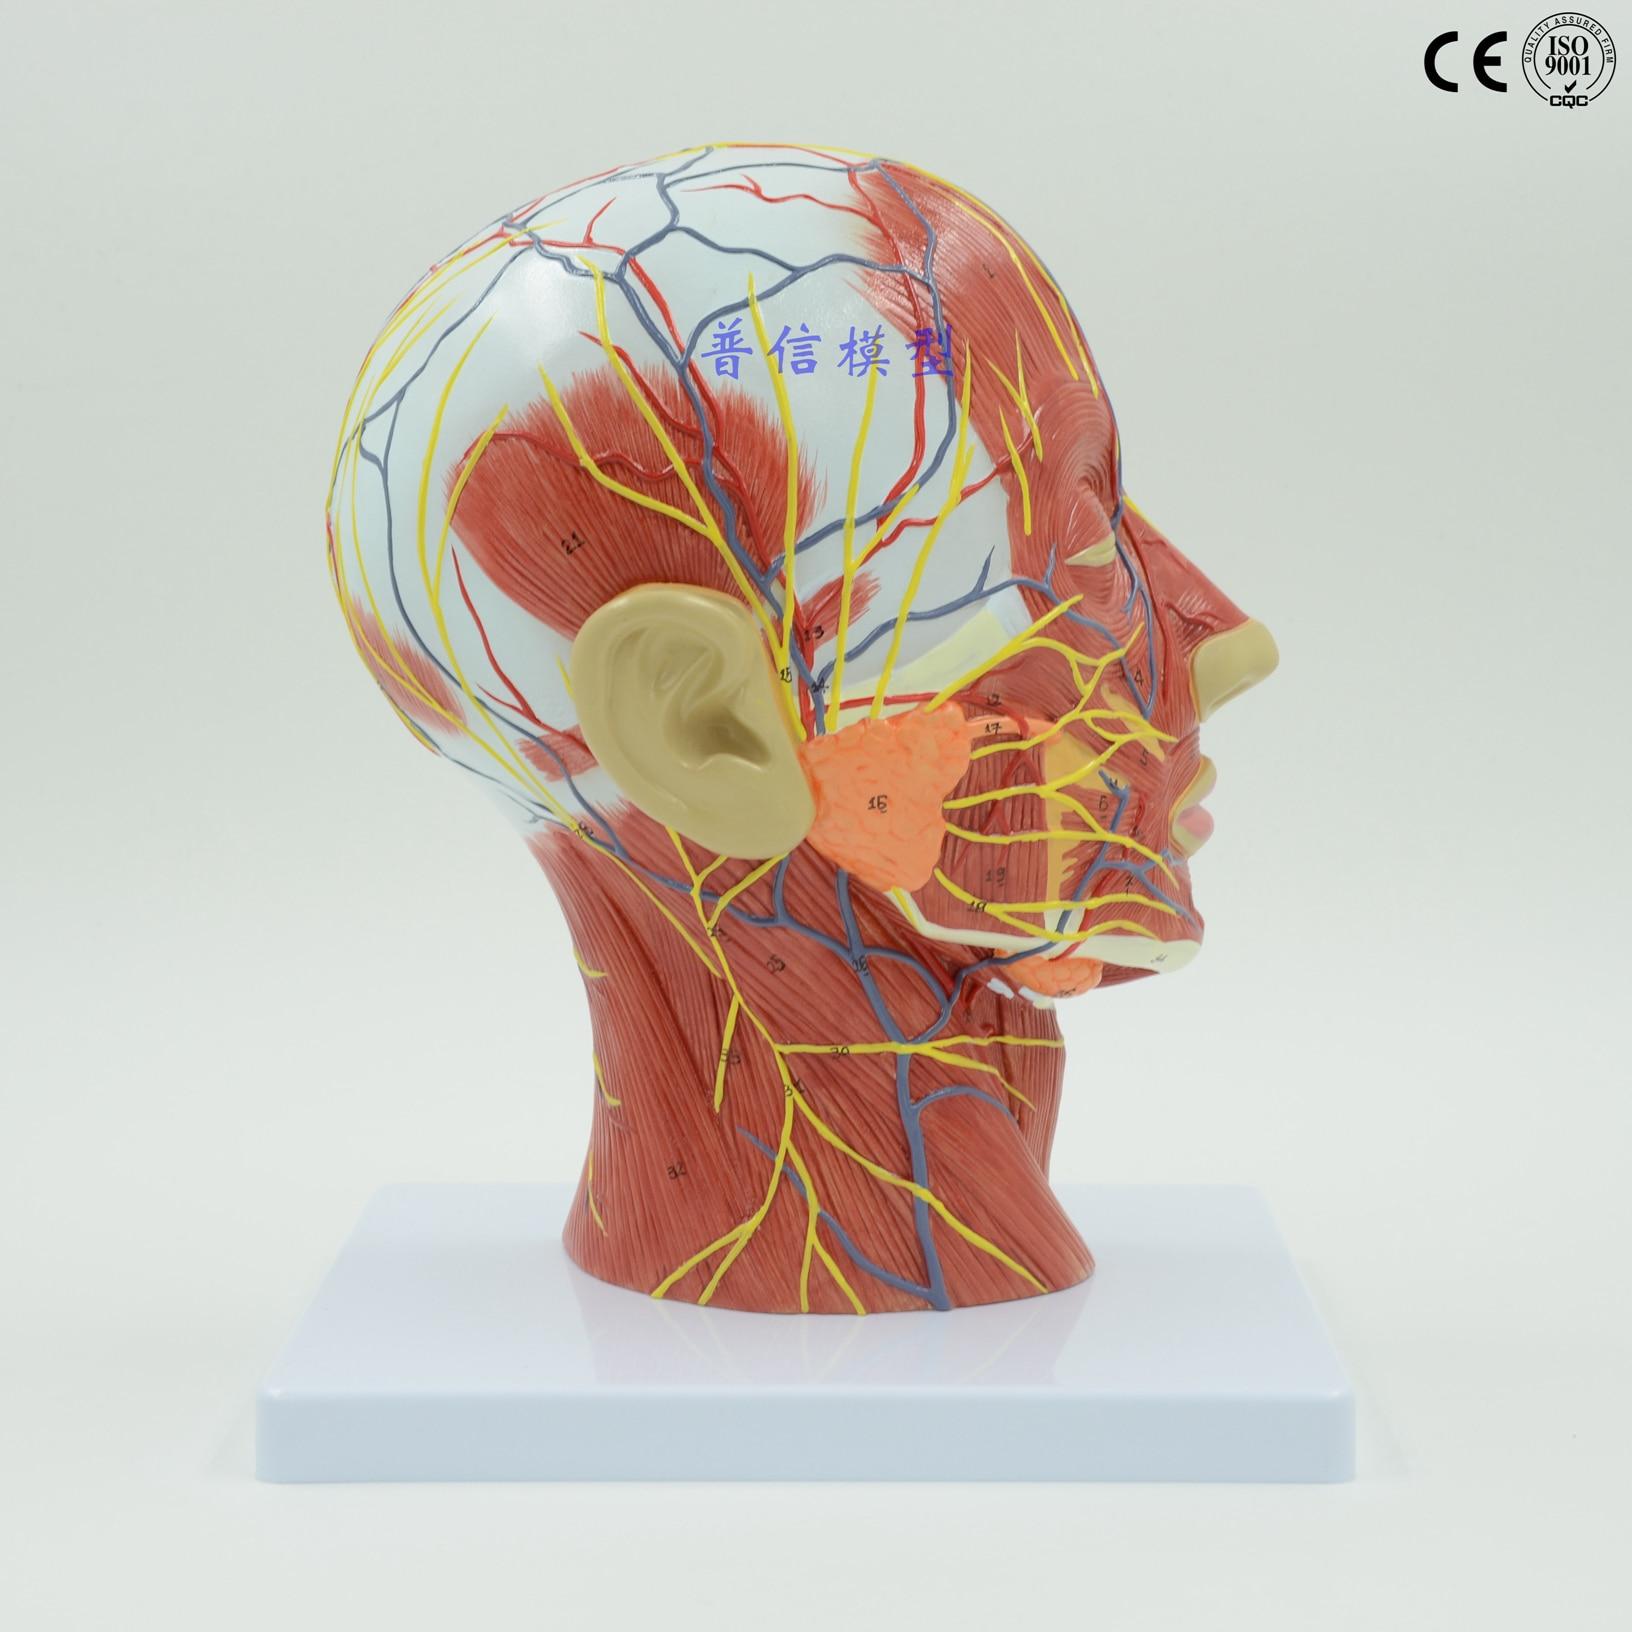 Medical Head Facial Anatomy Model of Brain Vascular Nerve Model of ...